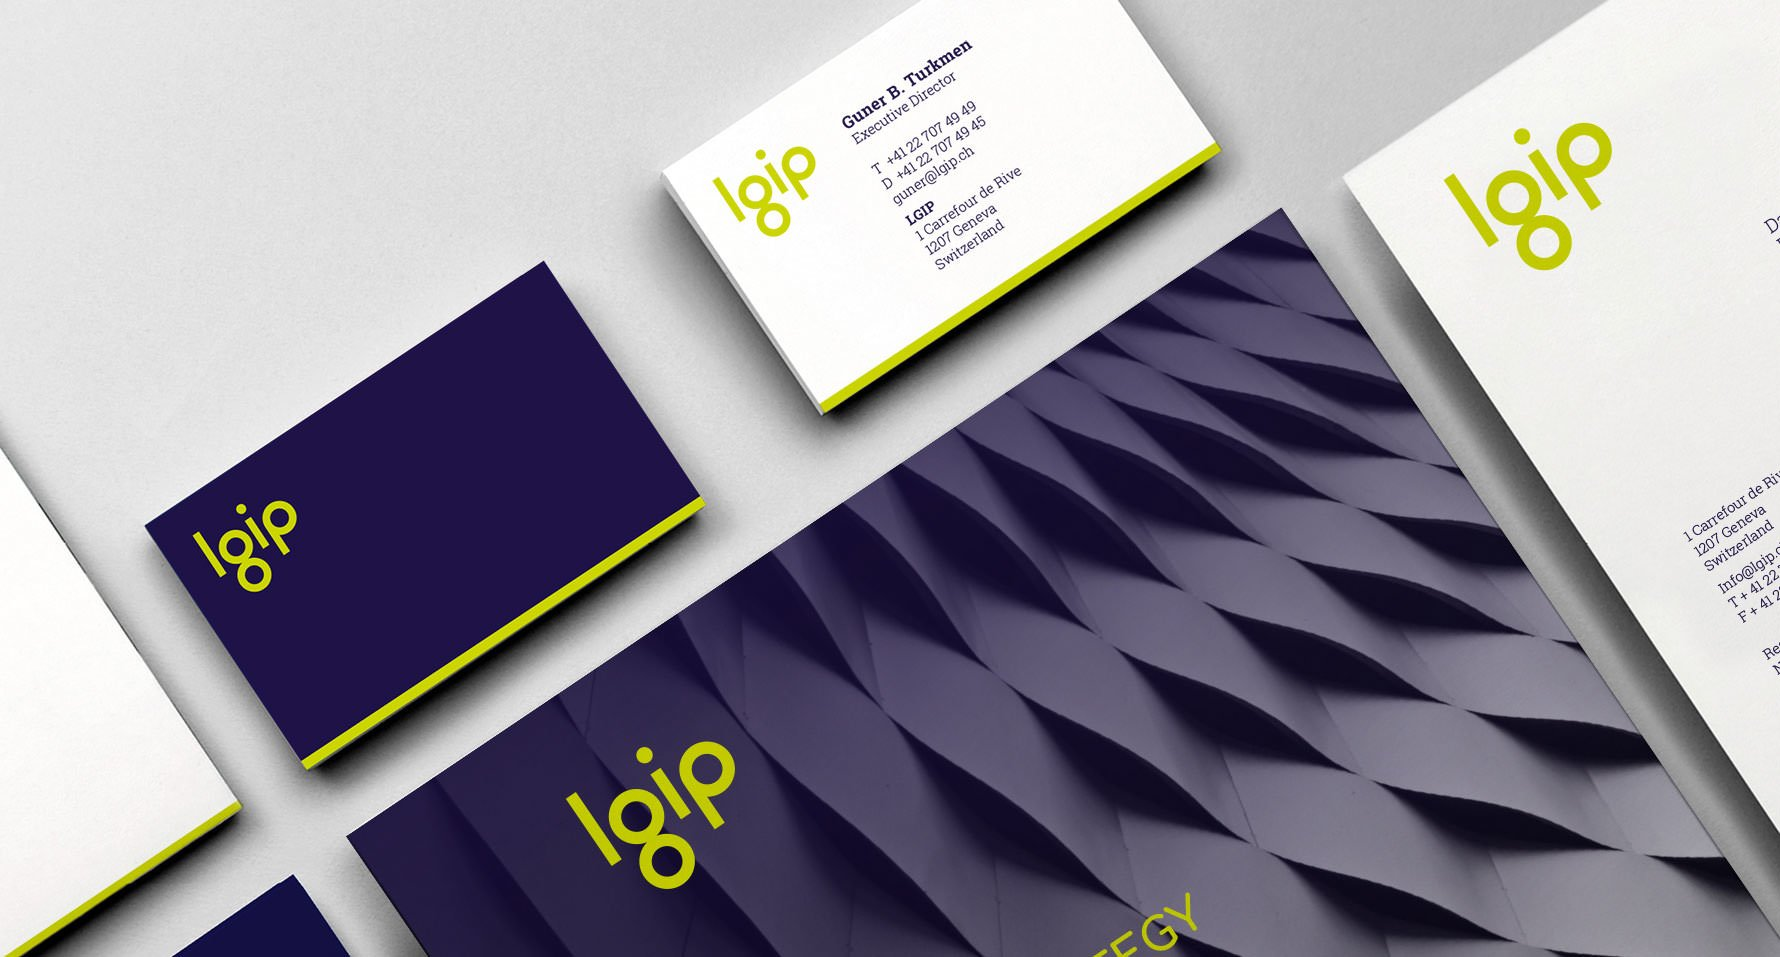 LGIP applications 72